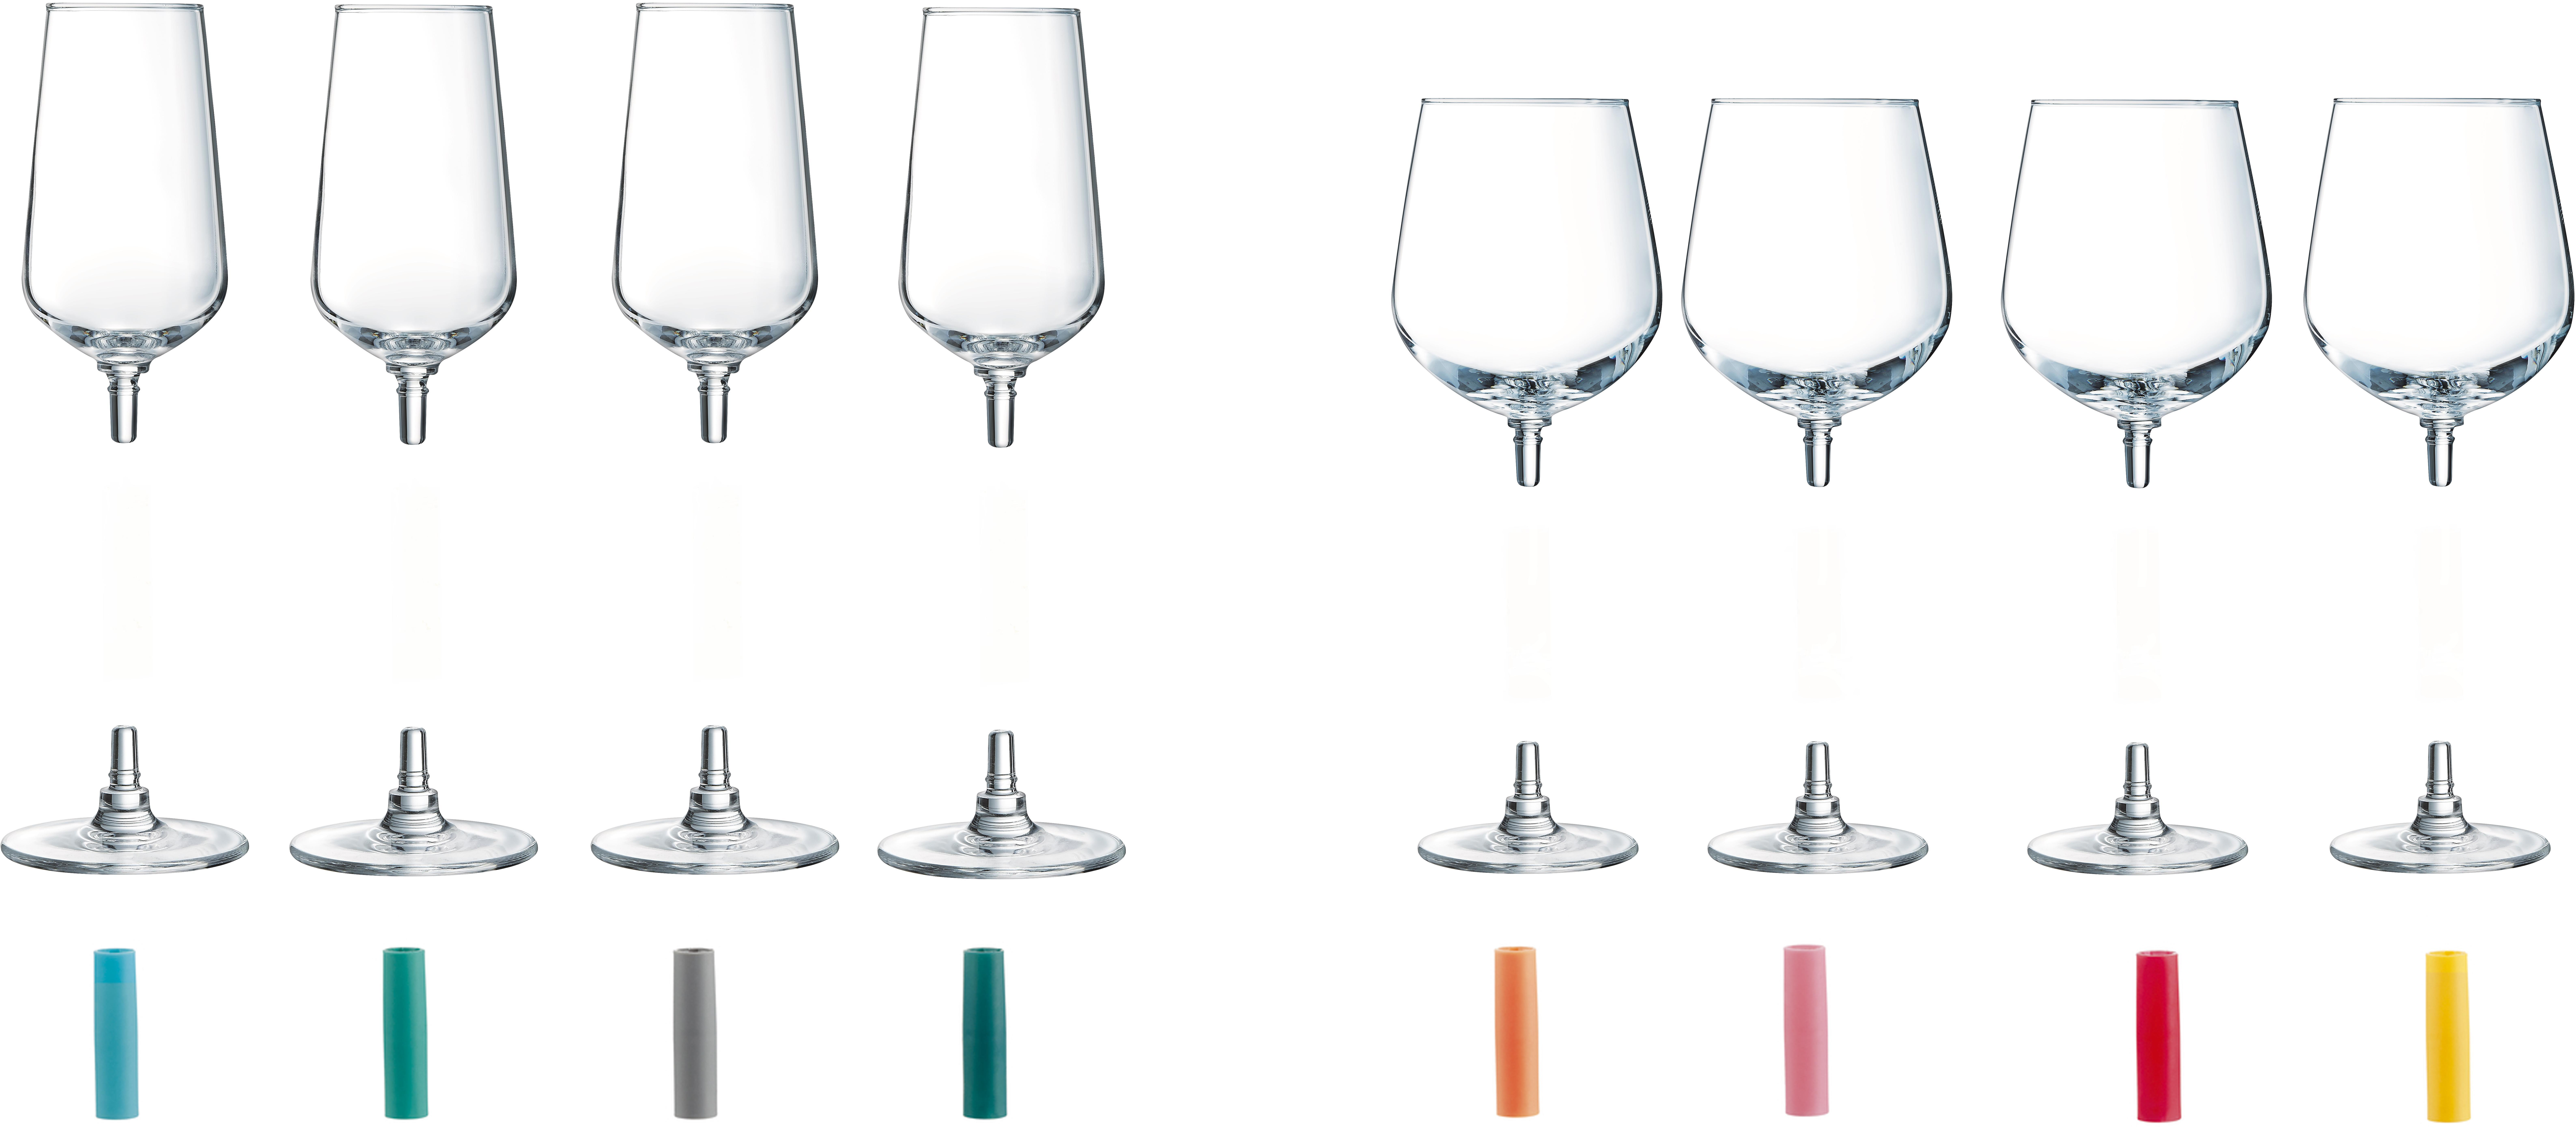 Luminarc Gläser-Set »LUMIKIT«, (Set, 8 tlg.), 8 Gläser, incl. 8 farbigen Connectoren... kaufen